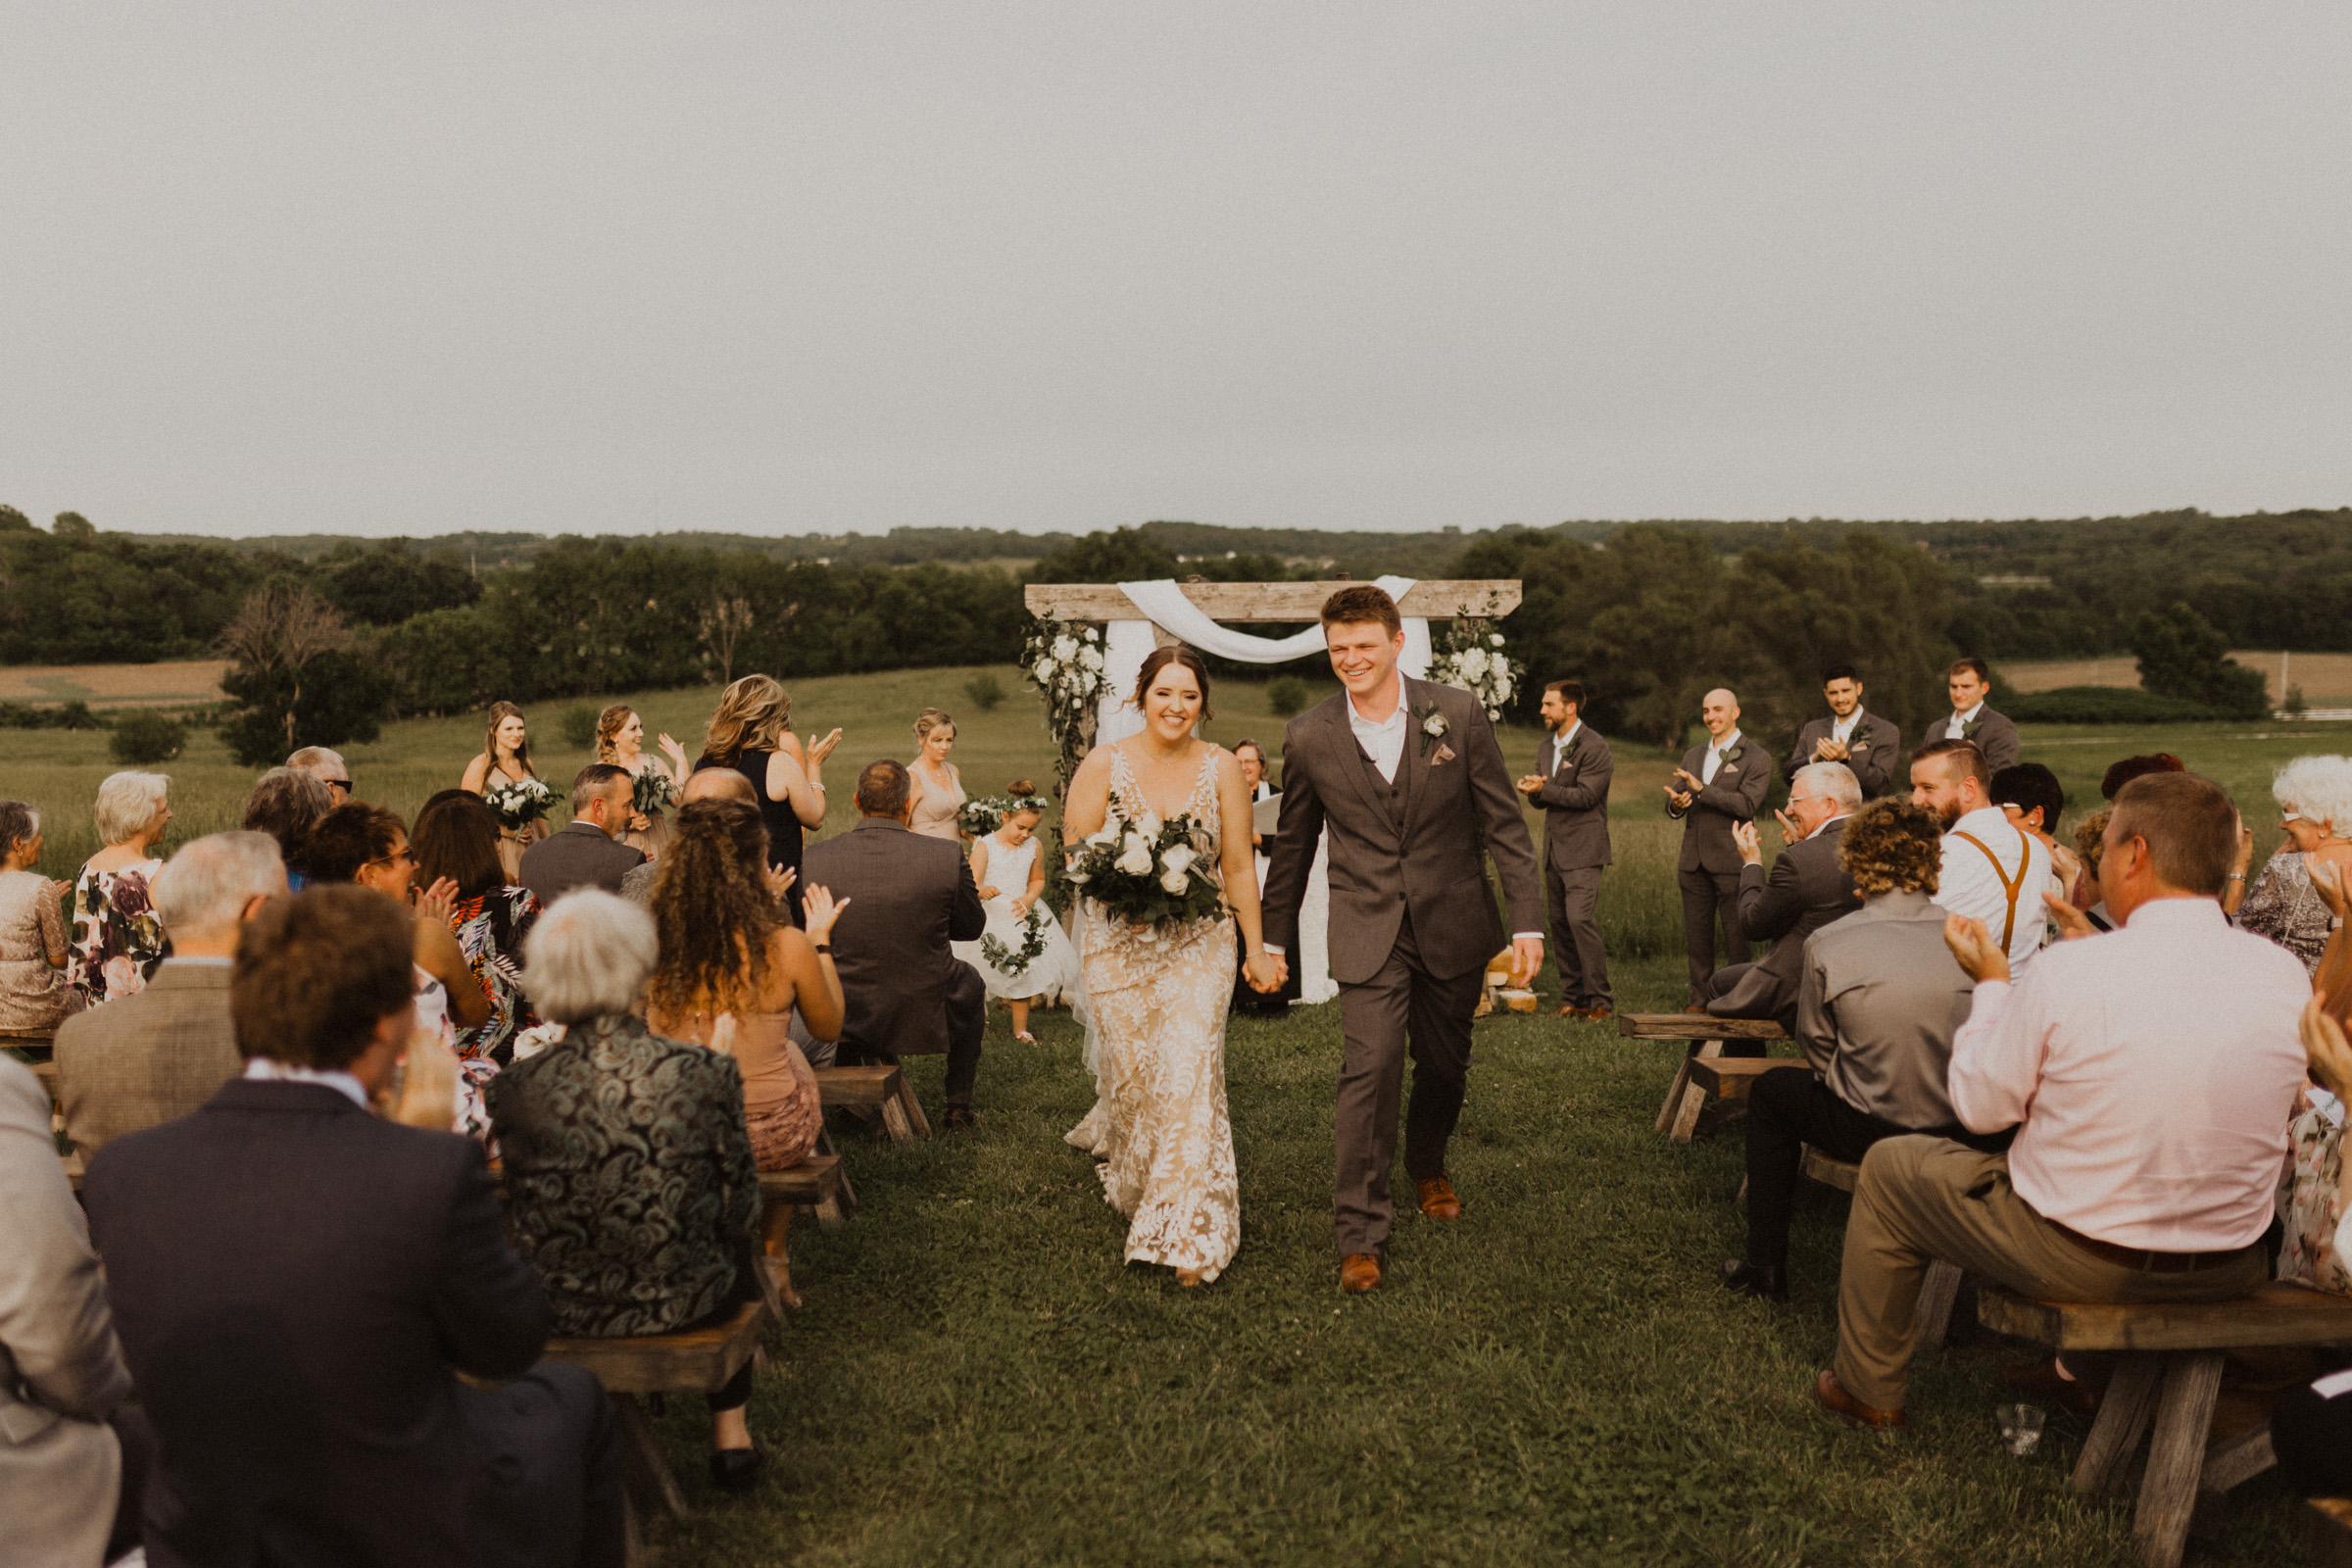 alyssa barletter photography weston red barn farm timberbarn summer outdoor wedding-47.jpg